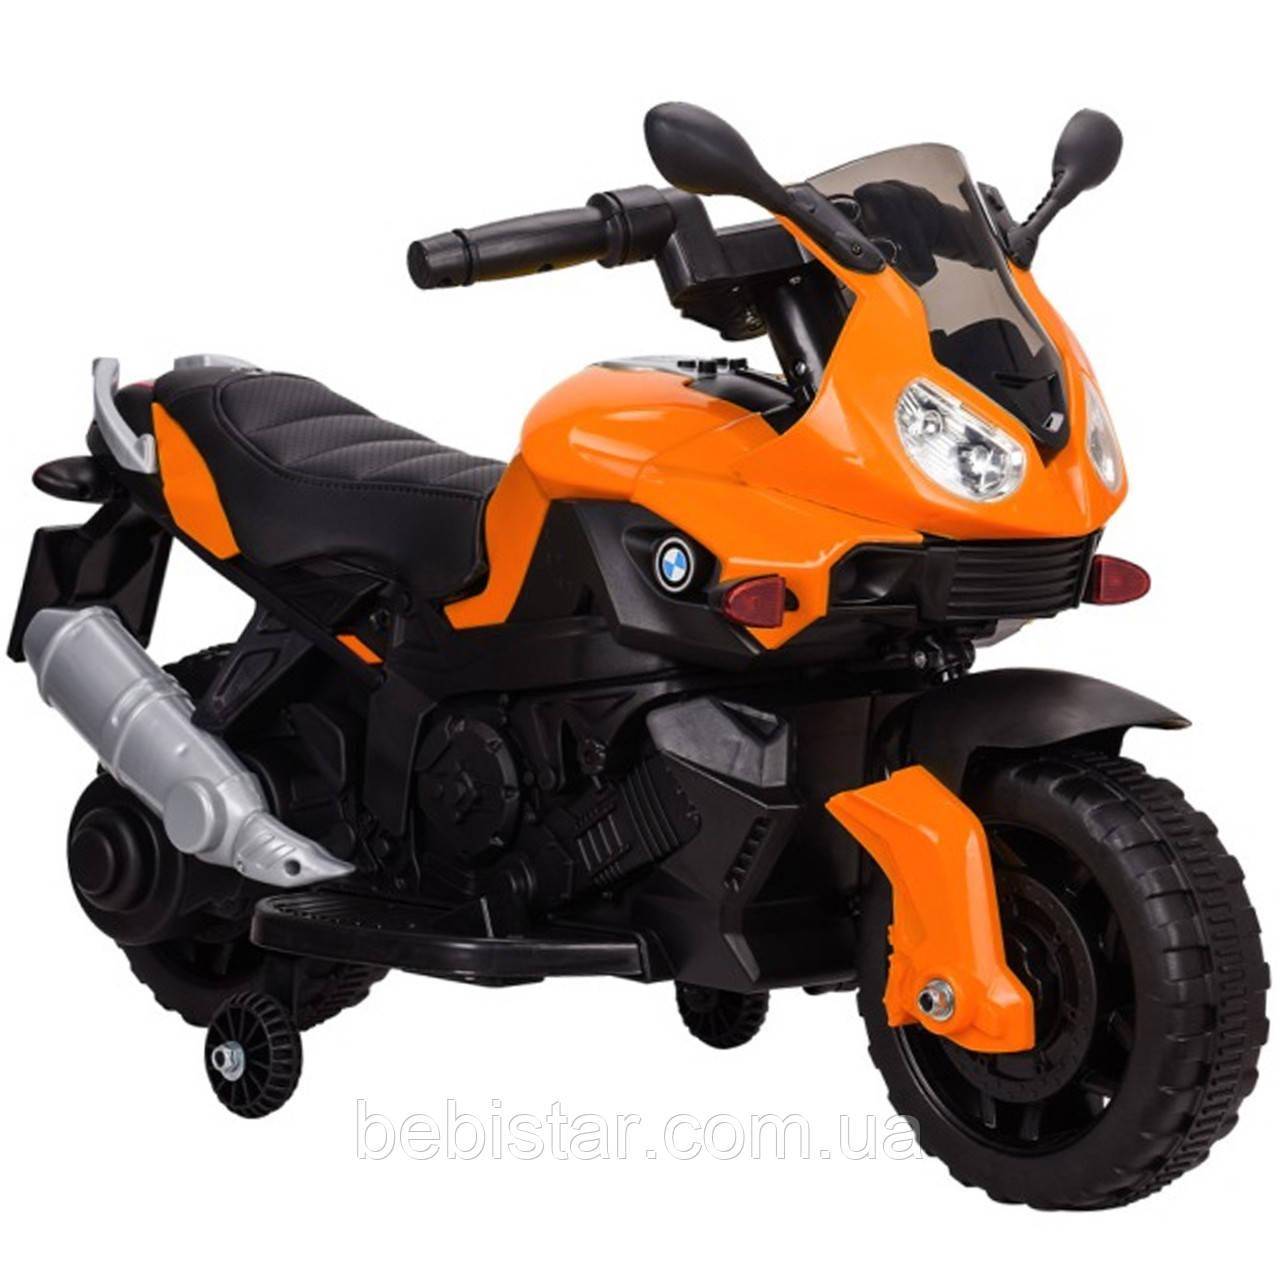 Электромобиль-мотоцикл оранжевый T-7219/1 ORANGE мотор 1*20W аккумулятор 6V4,5AH деткам 2-4 года